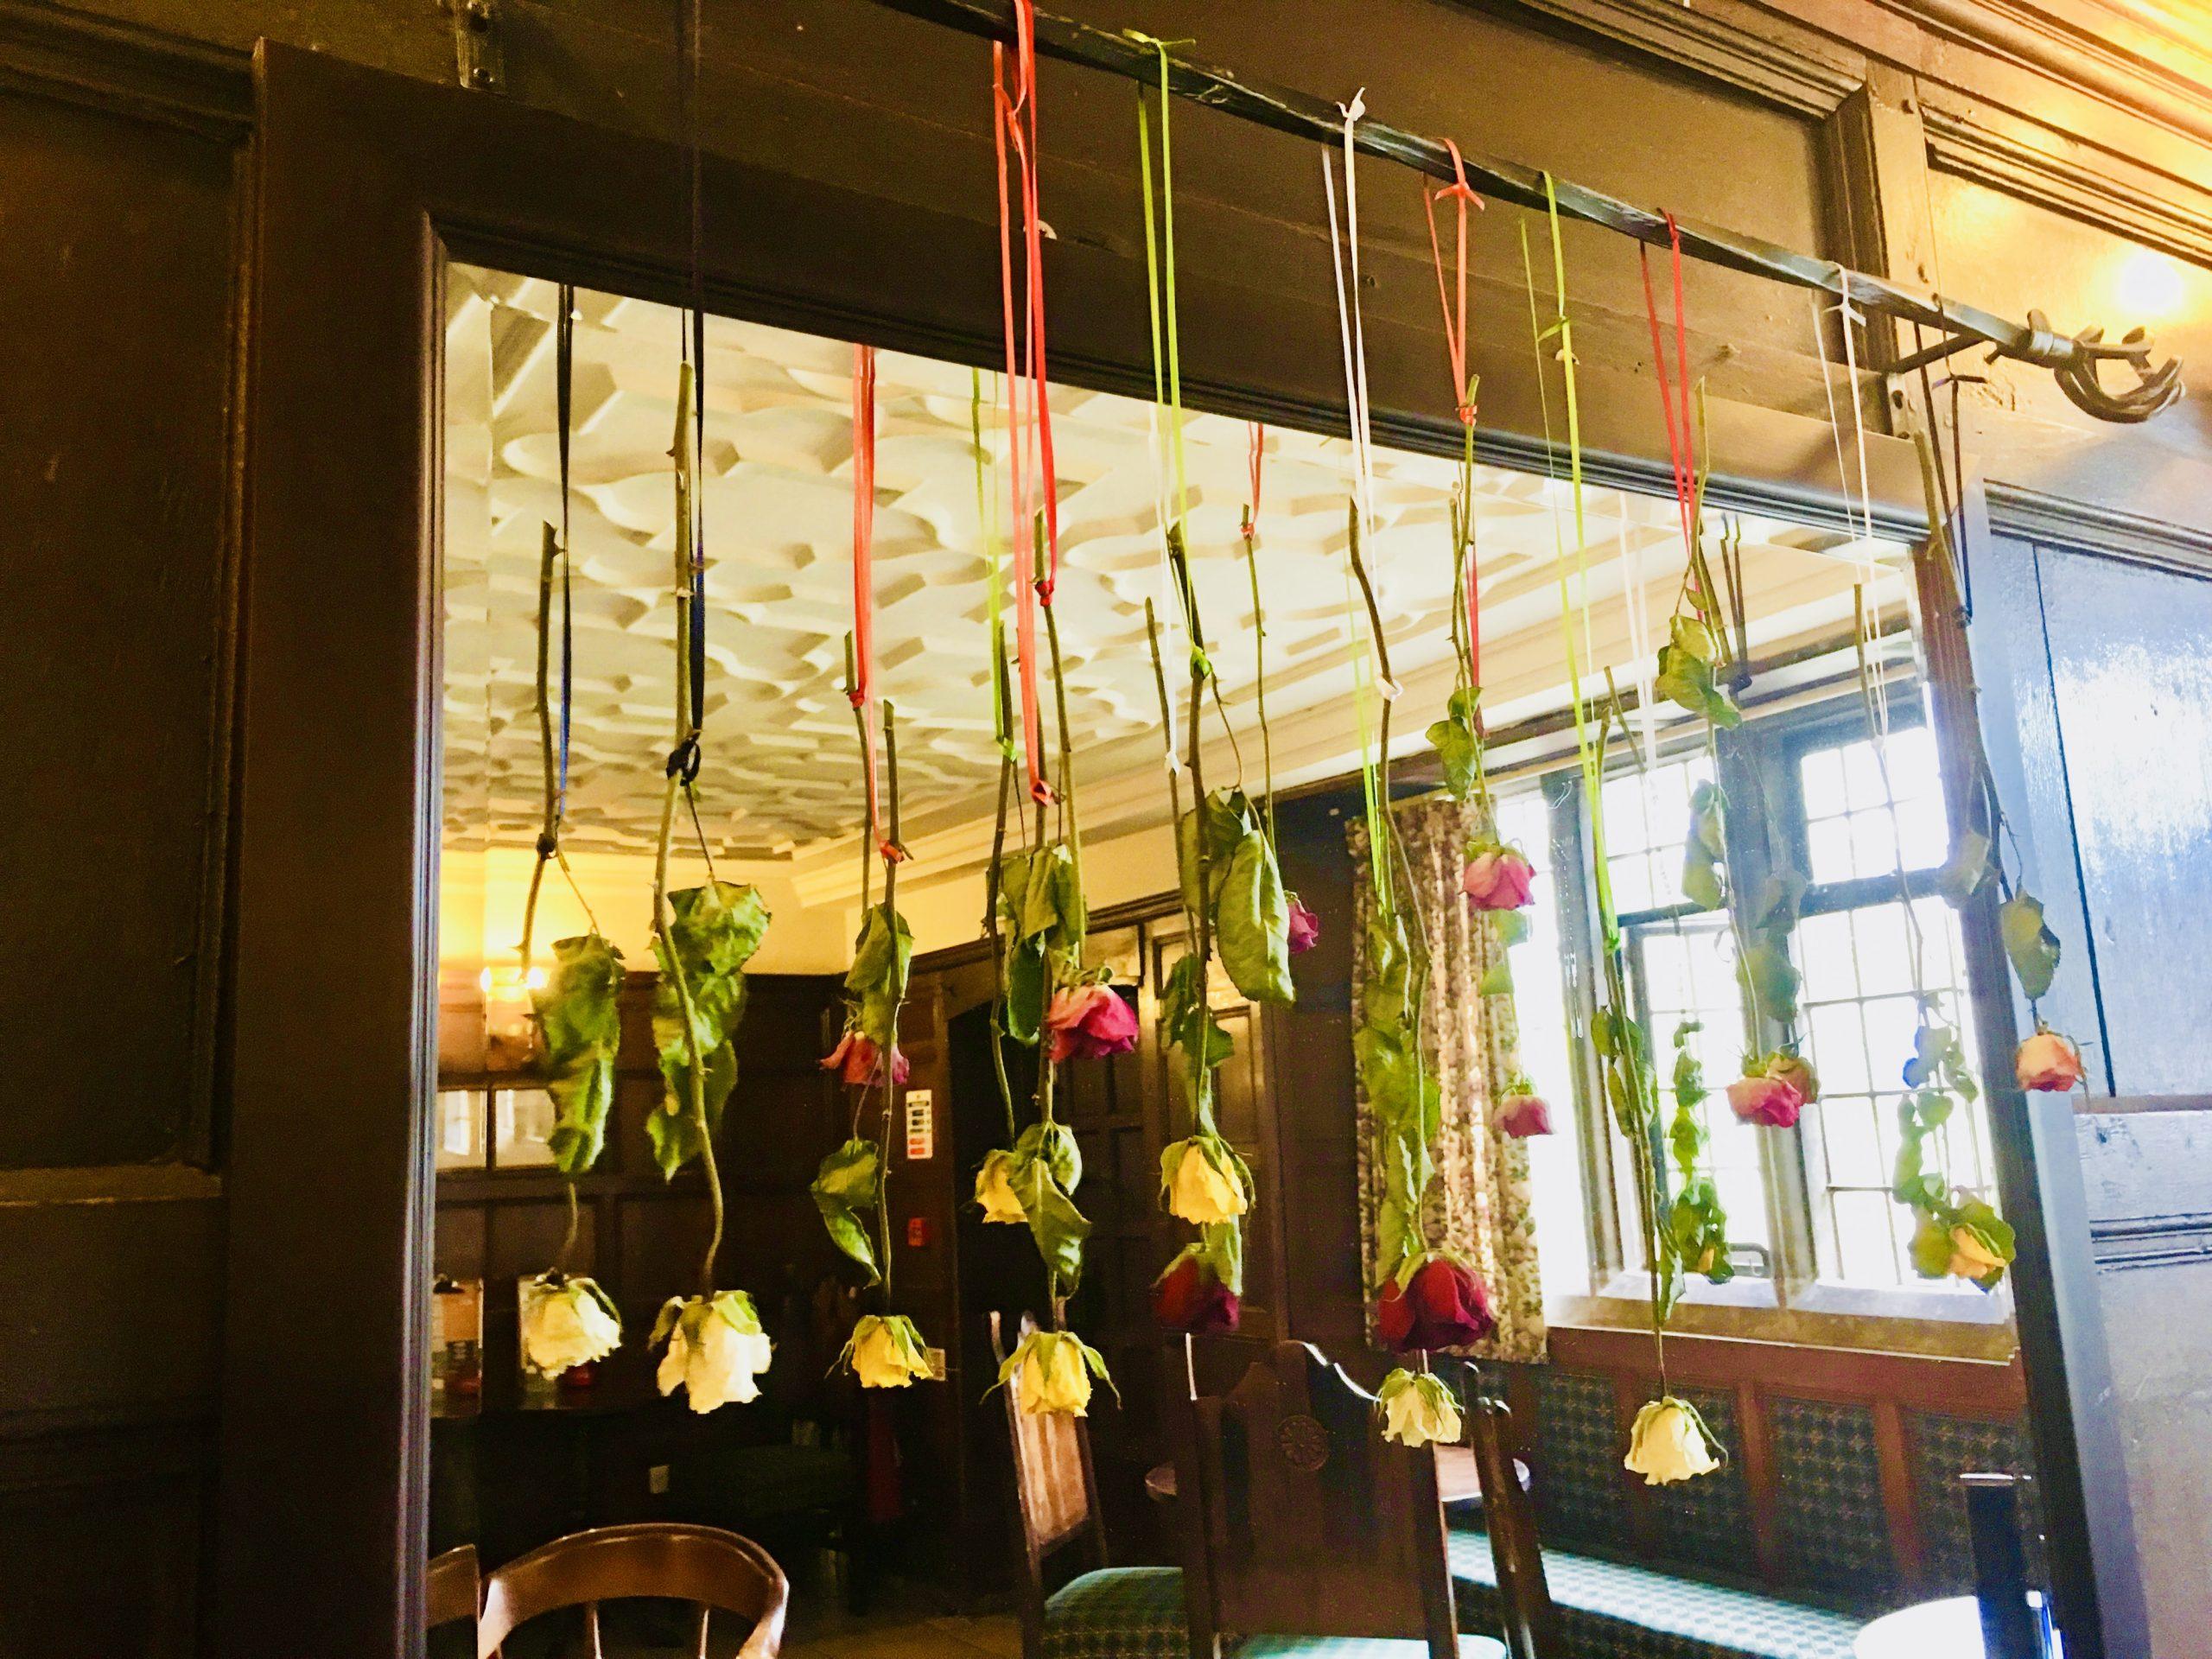 Drying flowers inside Hartington Hall